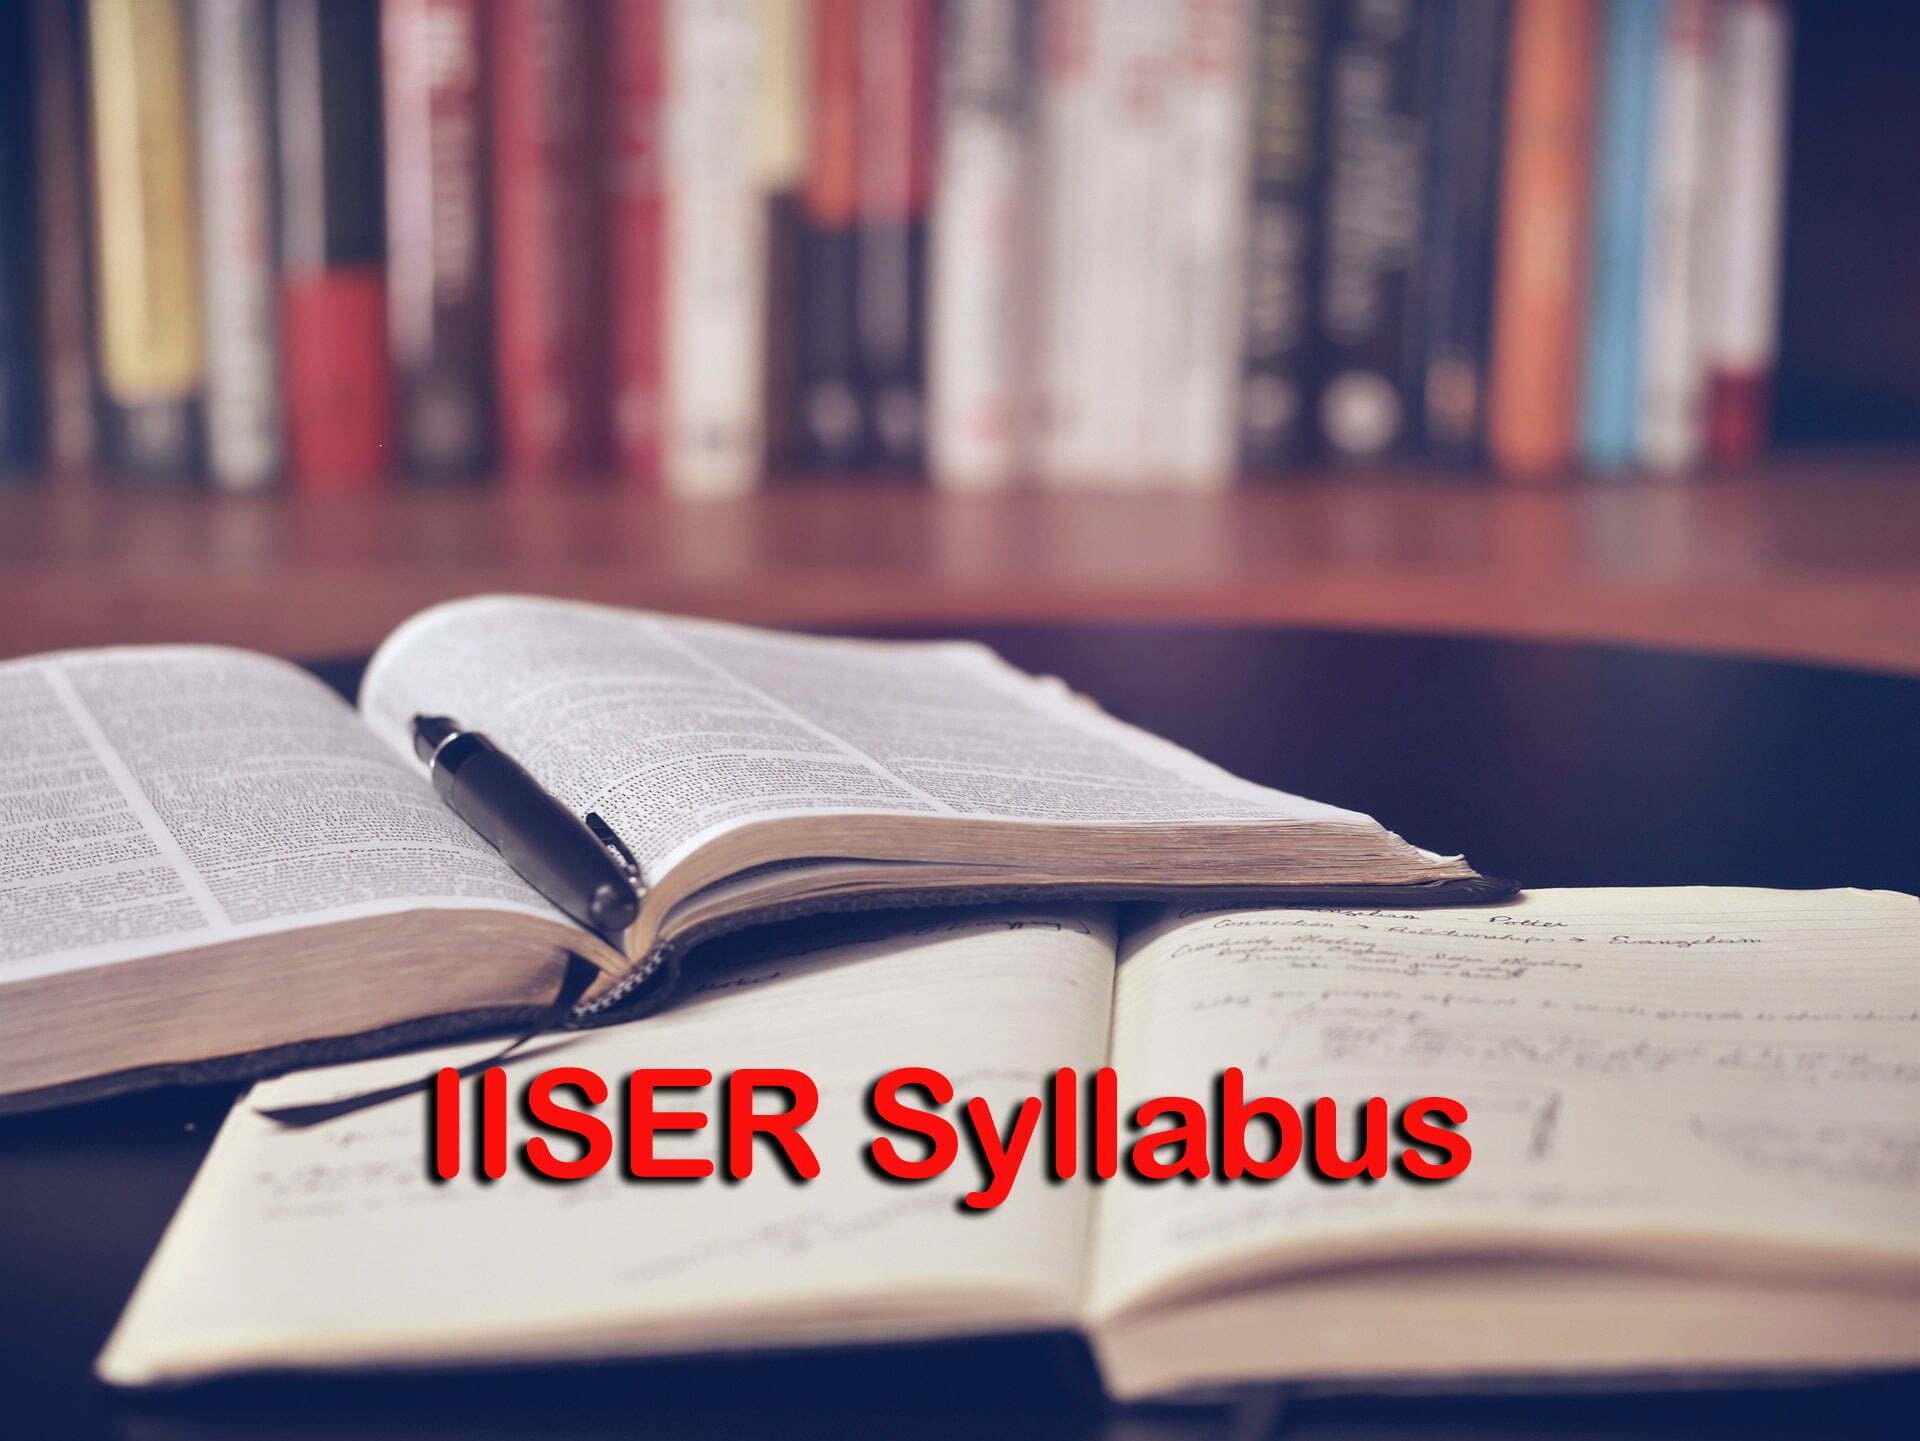 IISER Syllabus